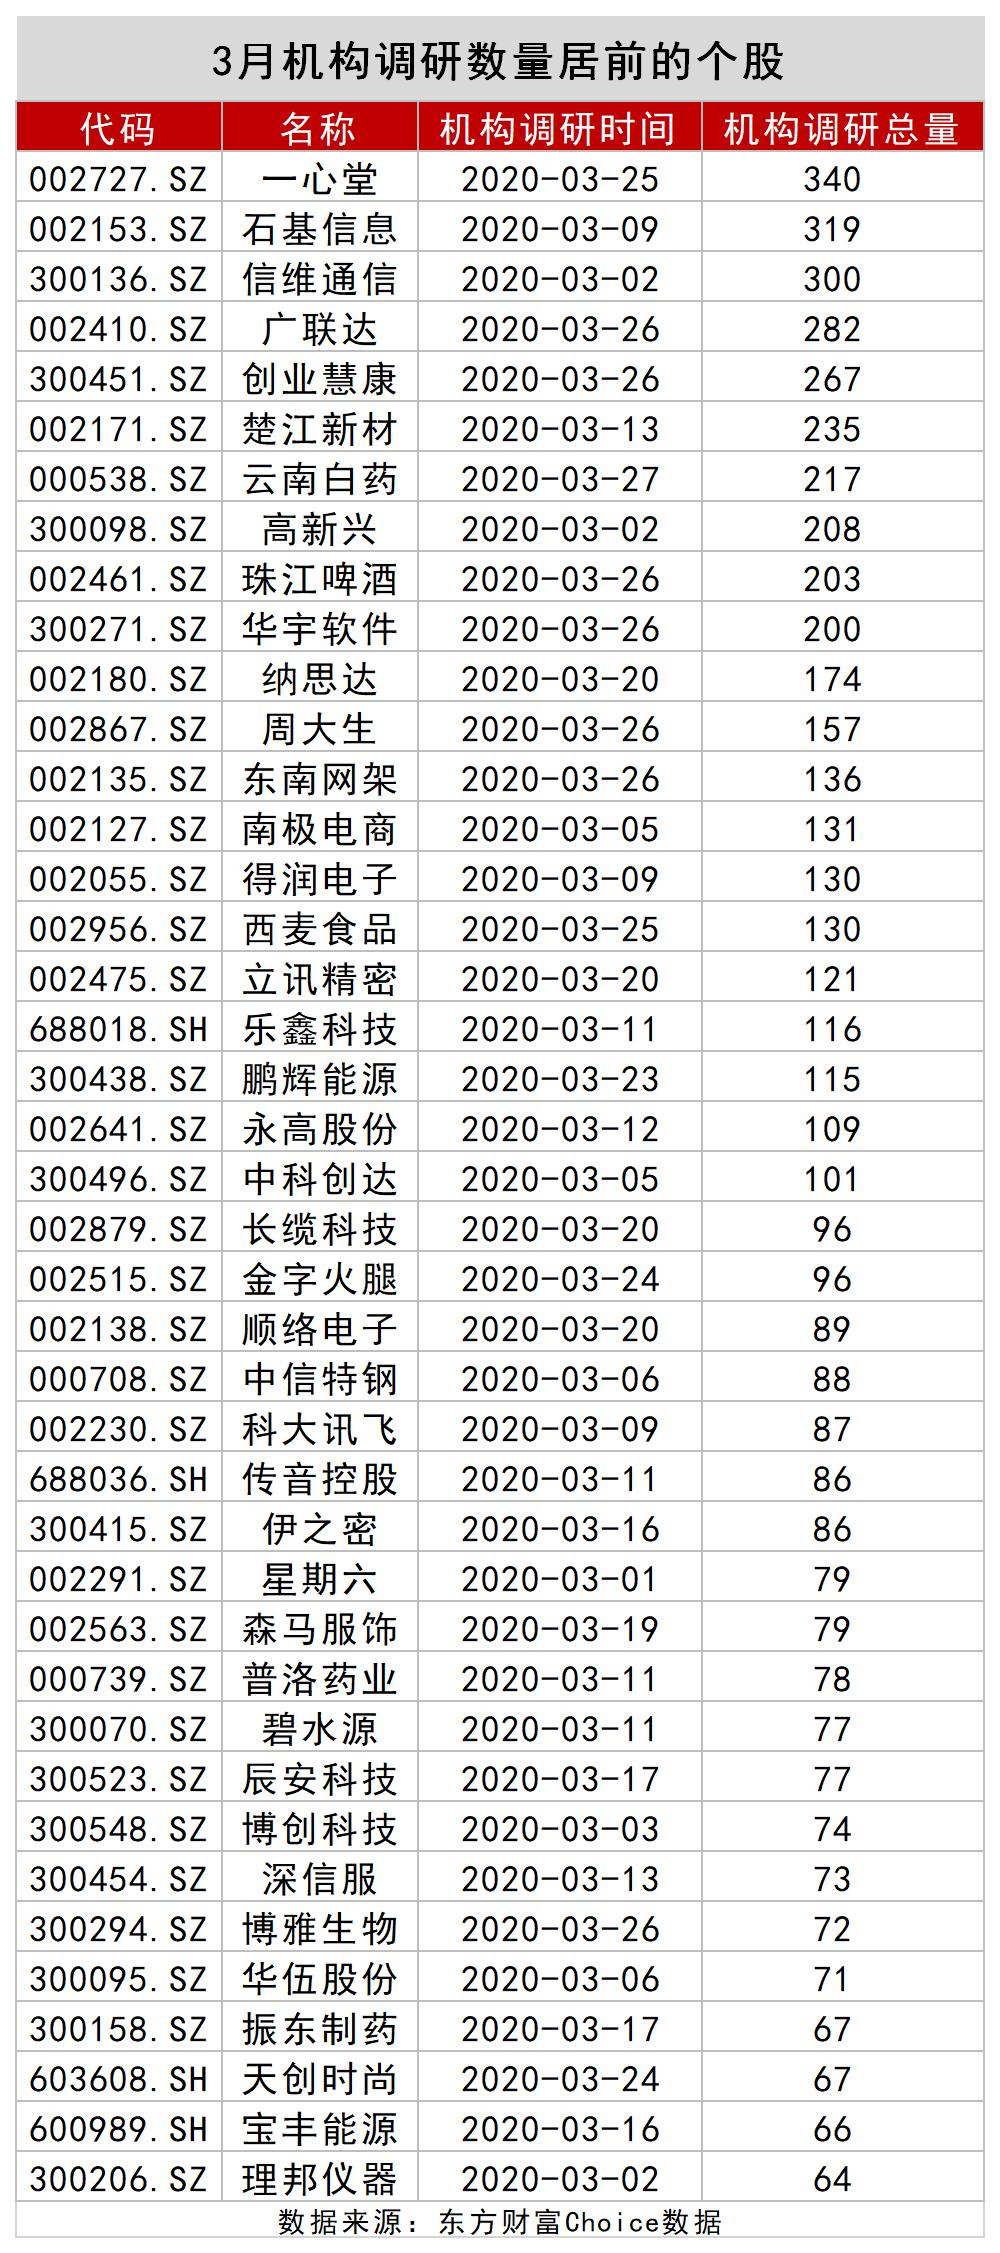 337d02d0.png?Expires=1901665734&OSSAccessKeyId=LTAIcYTsN8IjKgNY&Signature=01/7ZDxur4CbktVmy0zPRKttnTY=